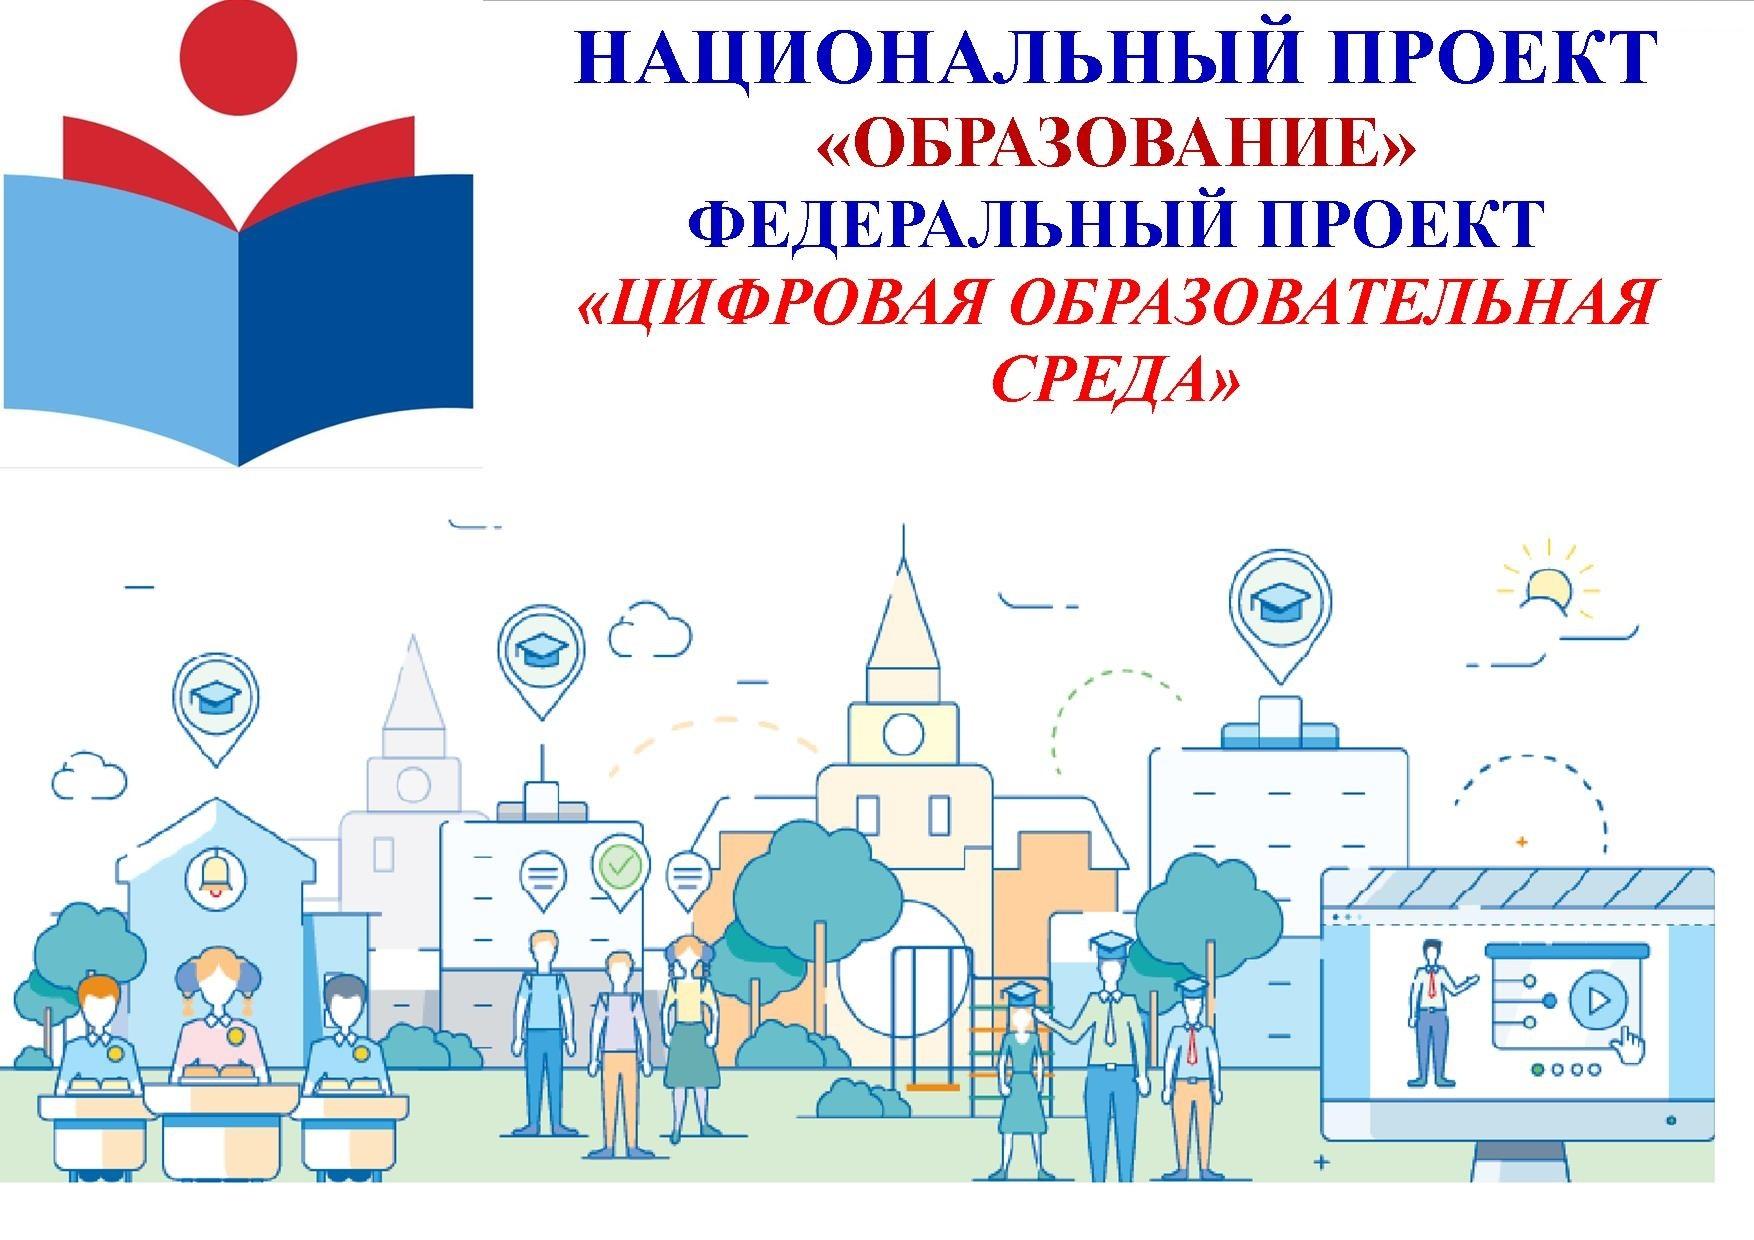 http://chschool5.ucoz.com/2020-2021/cos/Logotip.jpg